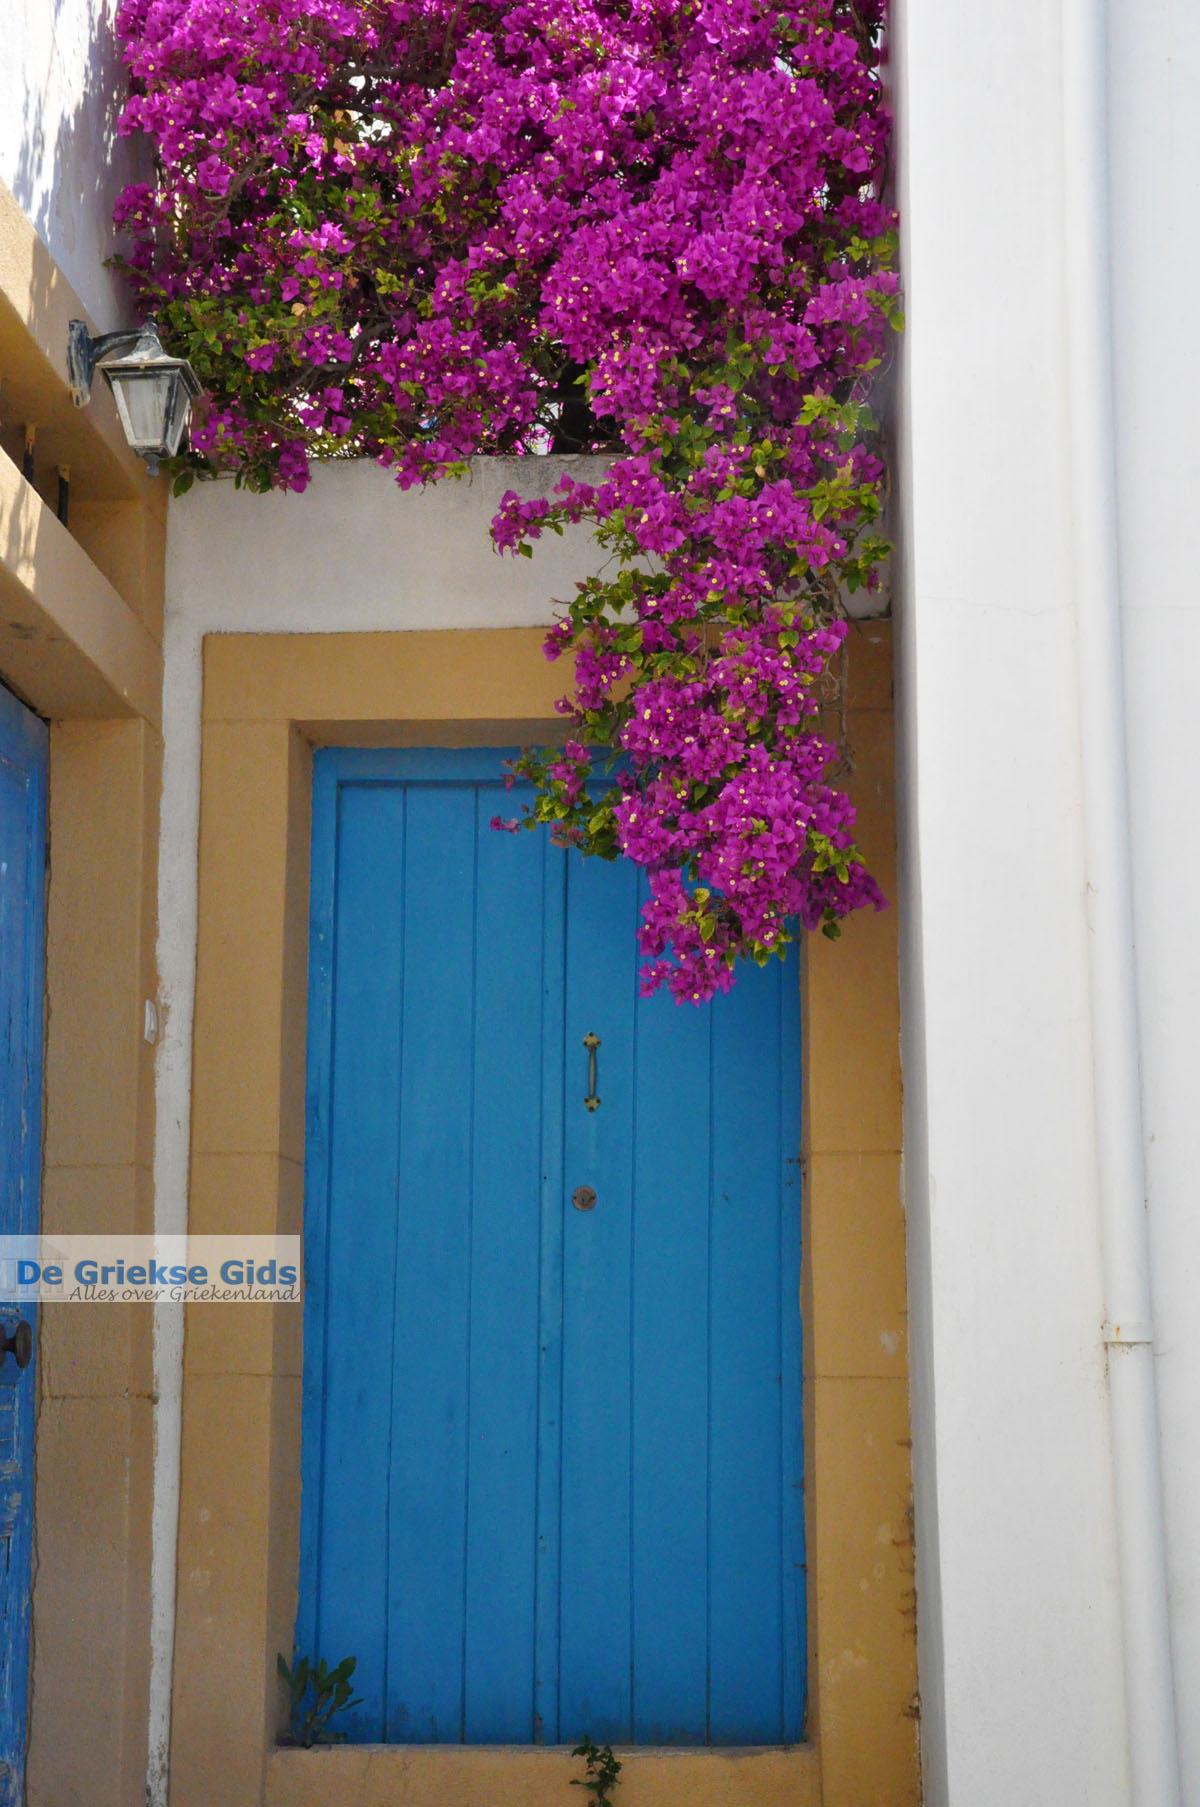 foto Kythira stad (Chora) | Griekenland | De Griekse Gids 103